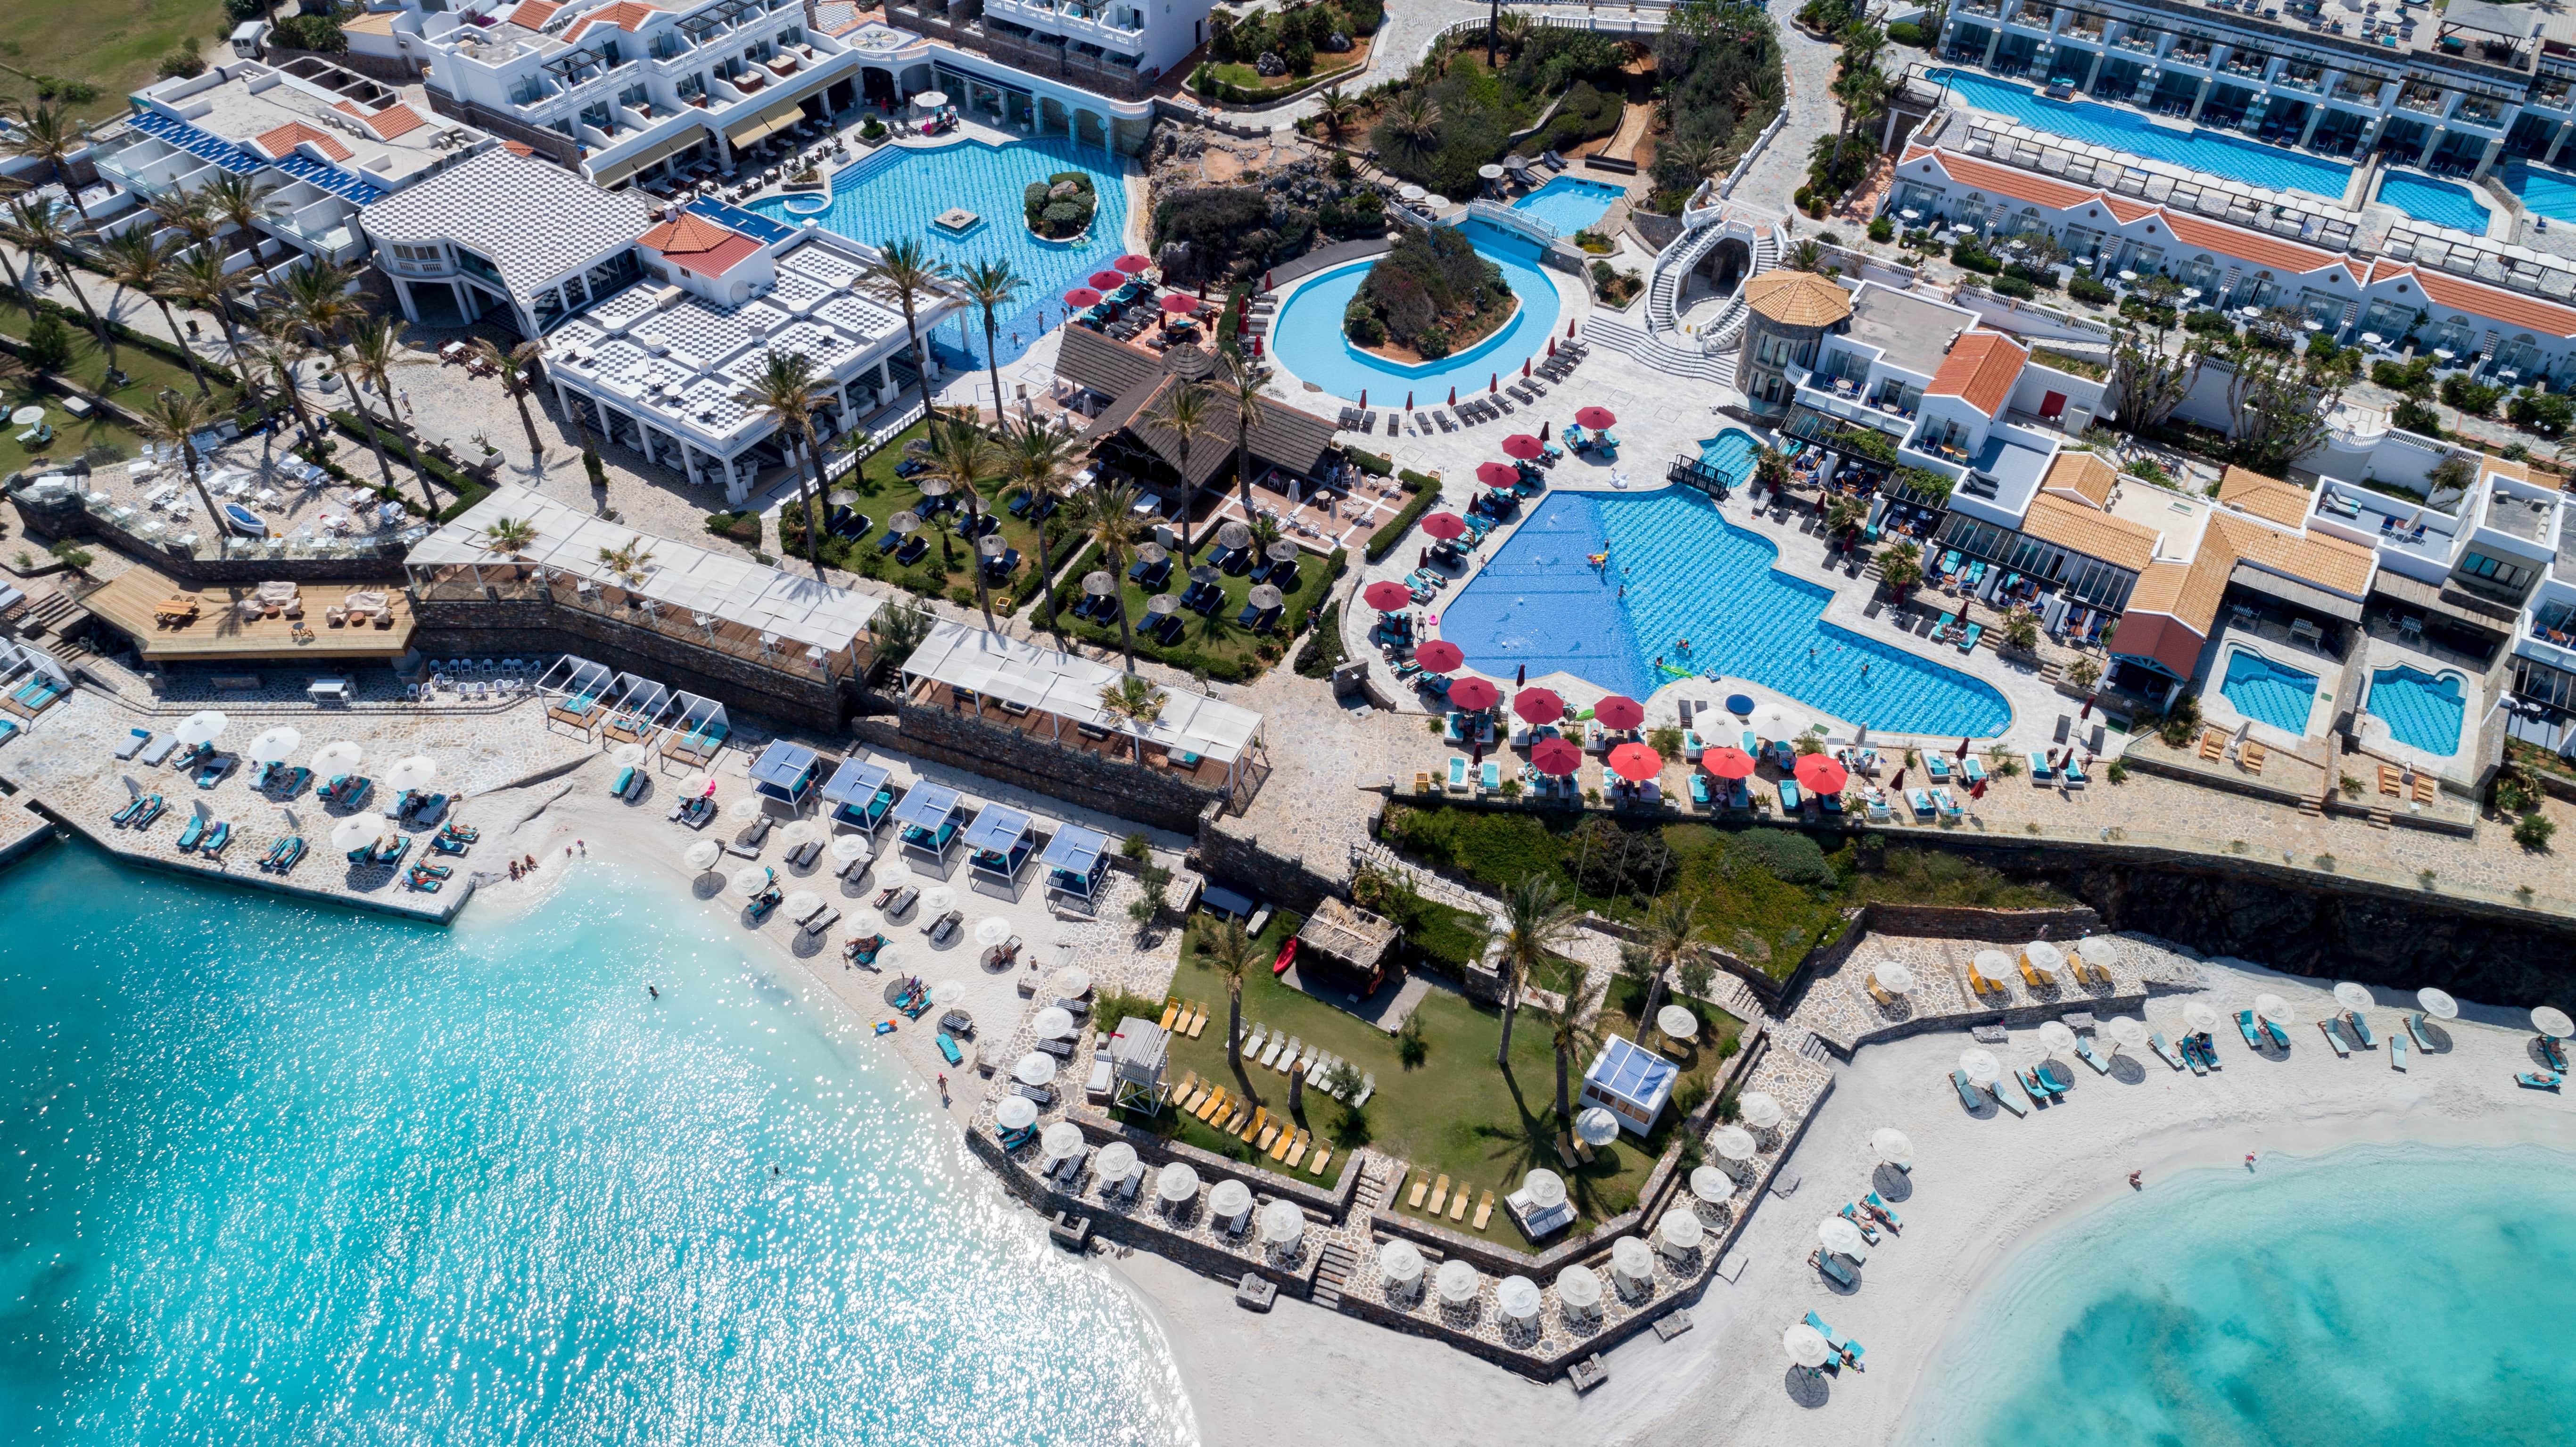 Radisson Blu Beach Resort Crete